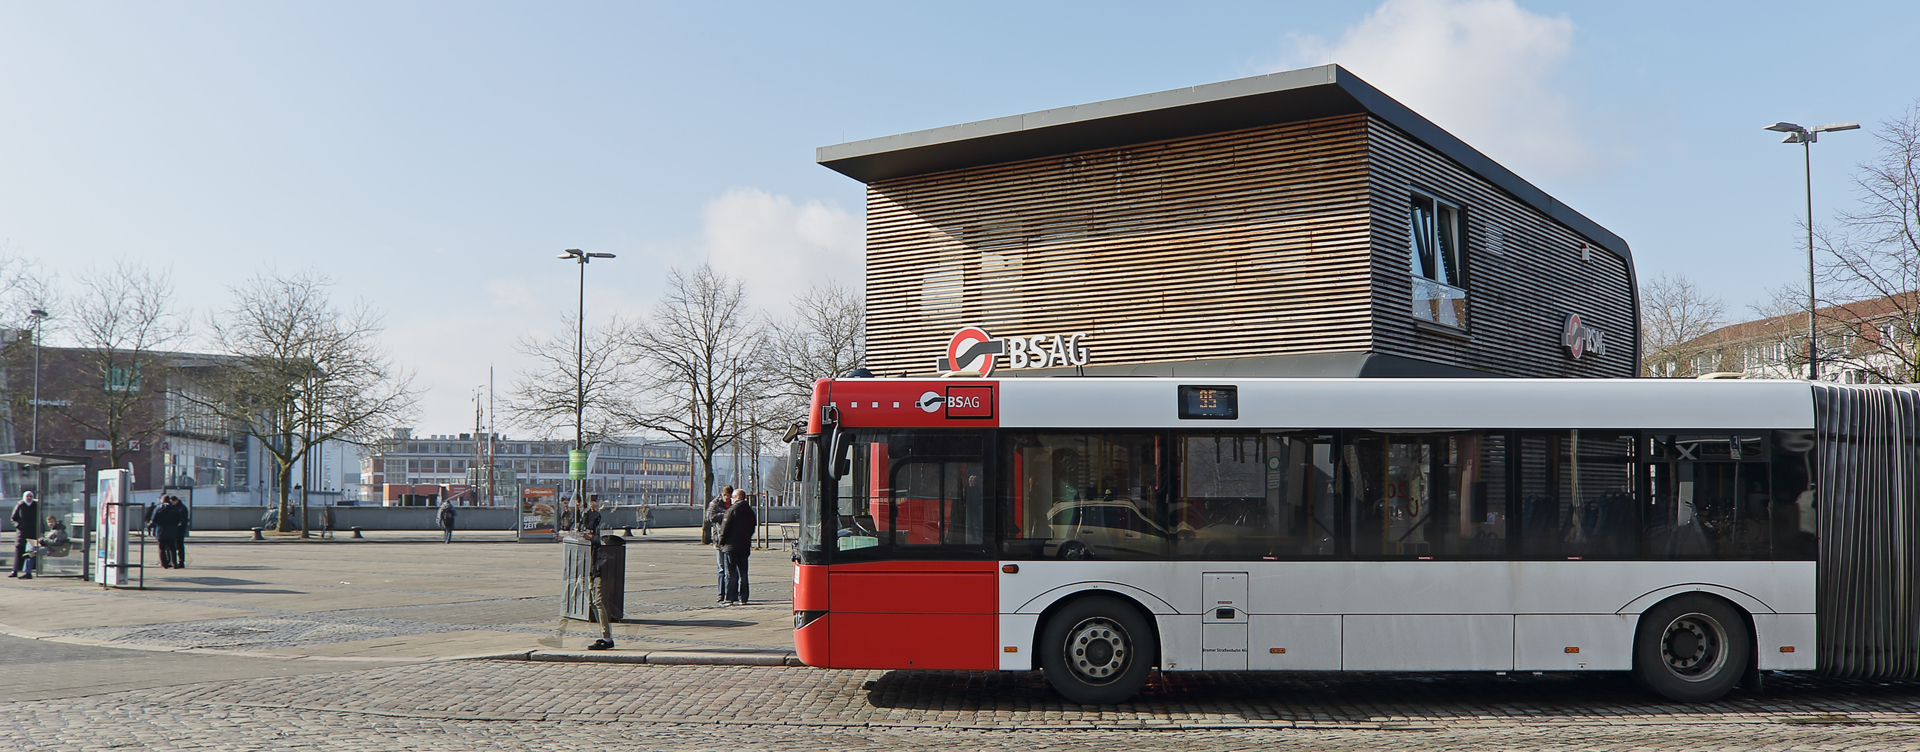 Verkehrslage - vegesack.de